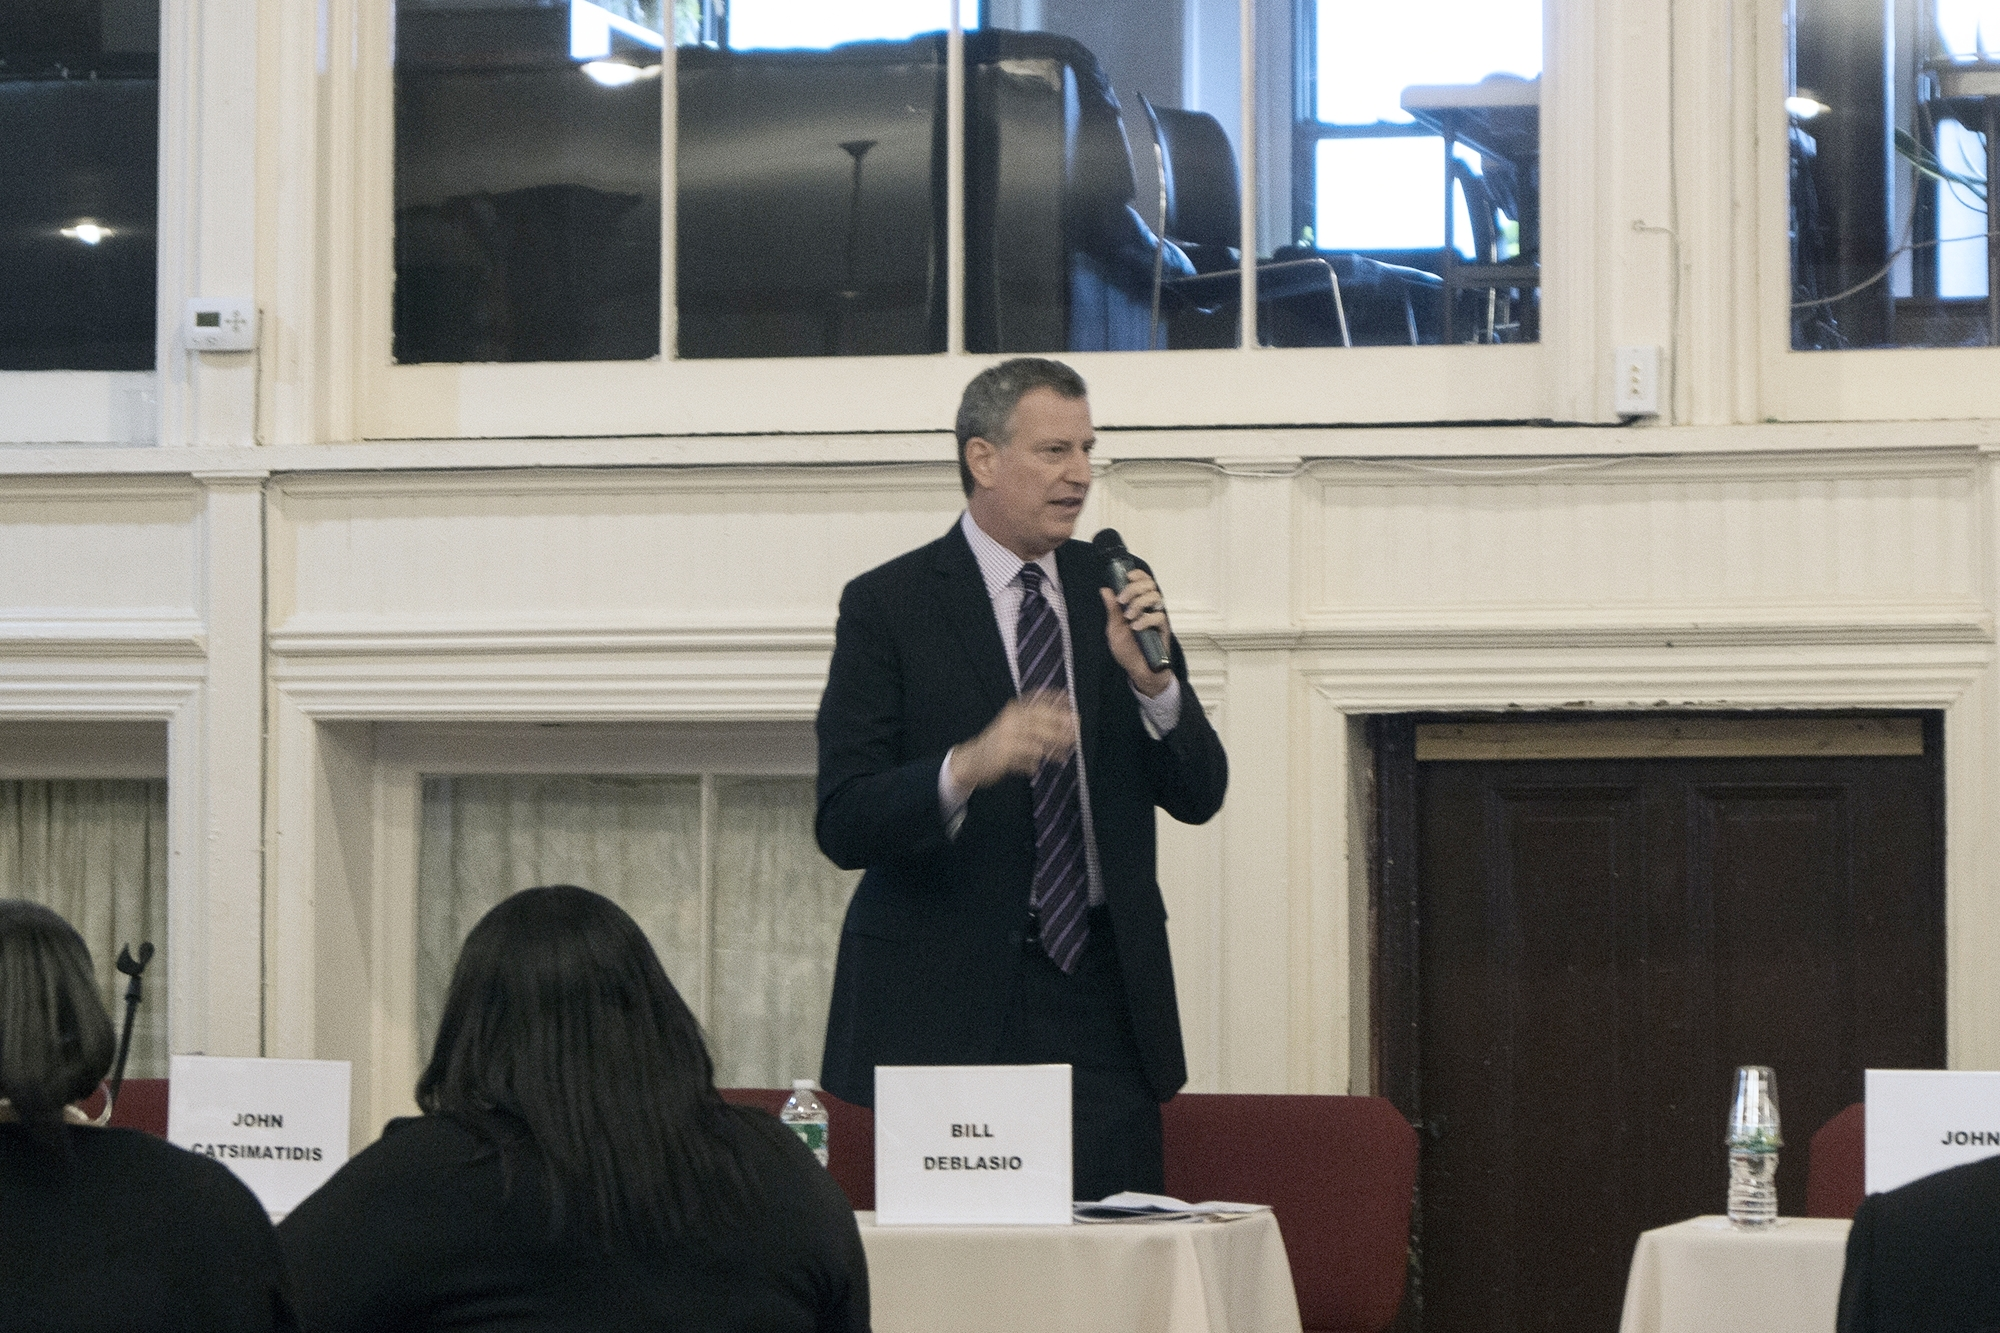 Then-candidate Bill DeBlasio speaking at the Second Legislative Forum.